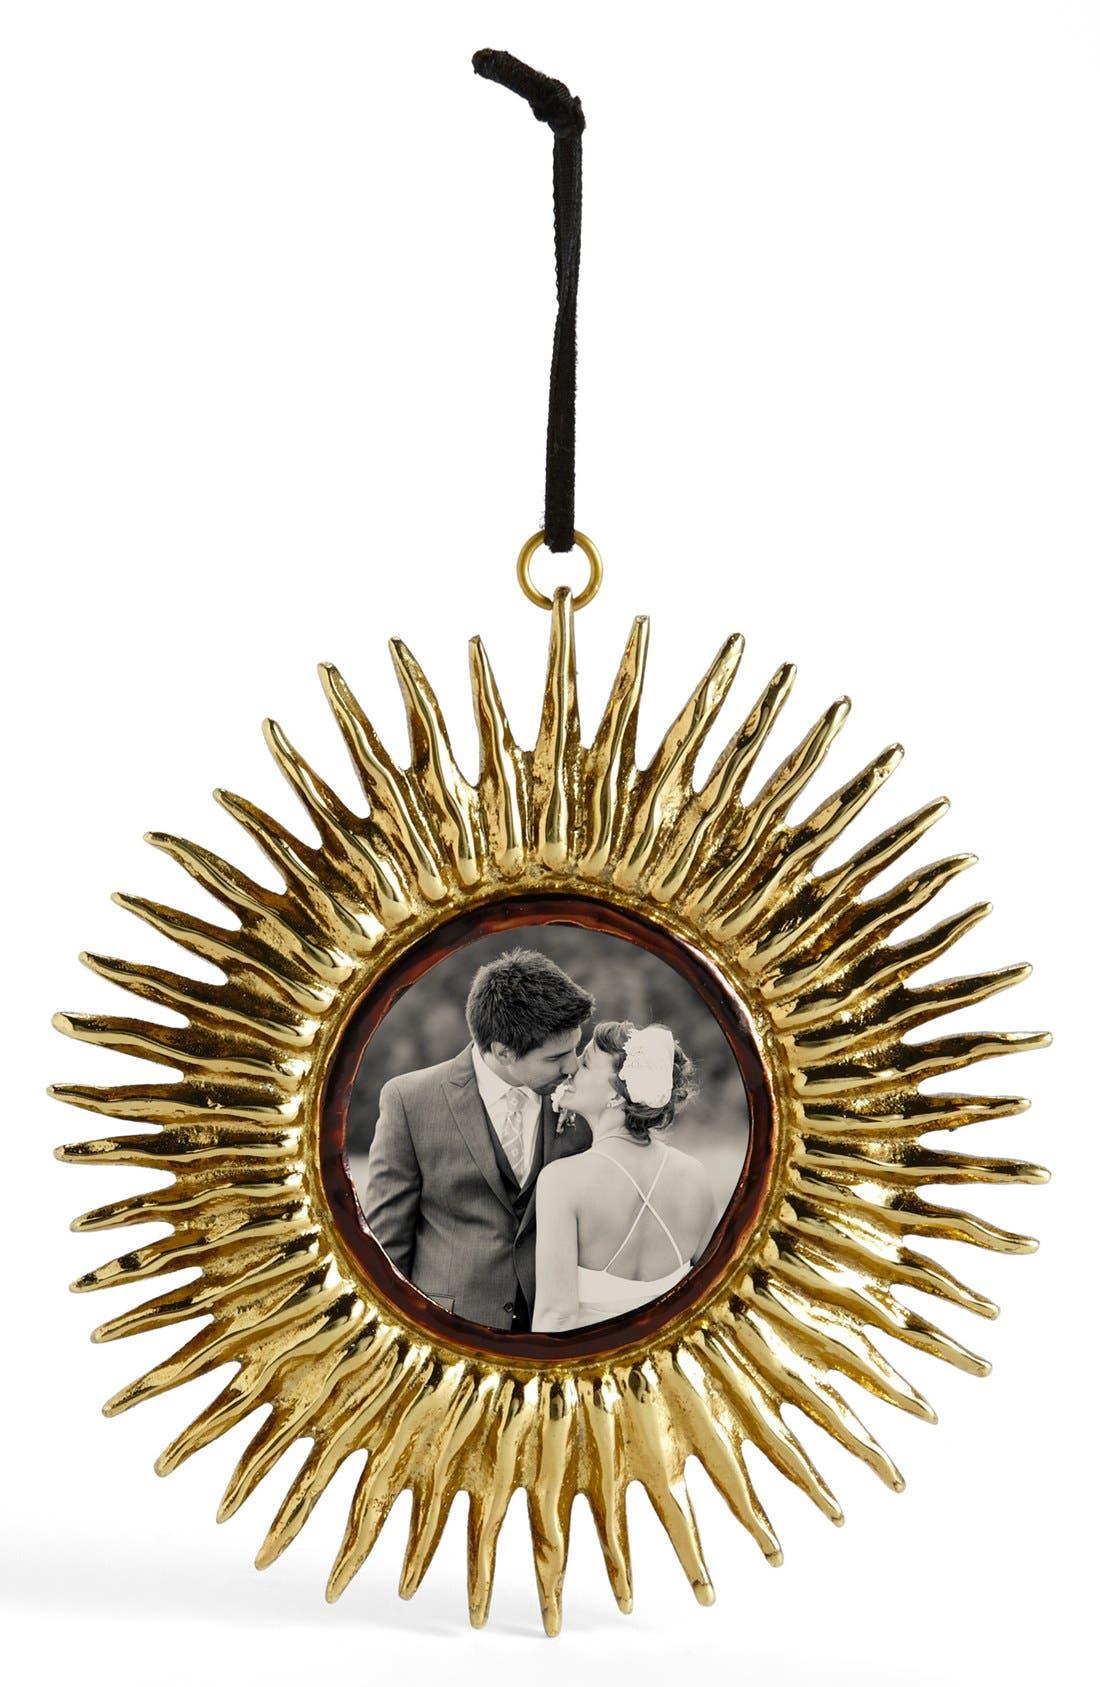 Main Image - Michael Aram 'Sunburst Frame' Ornament